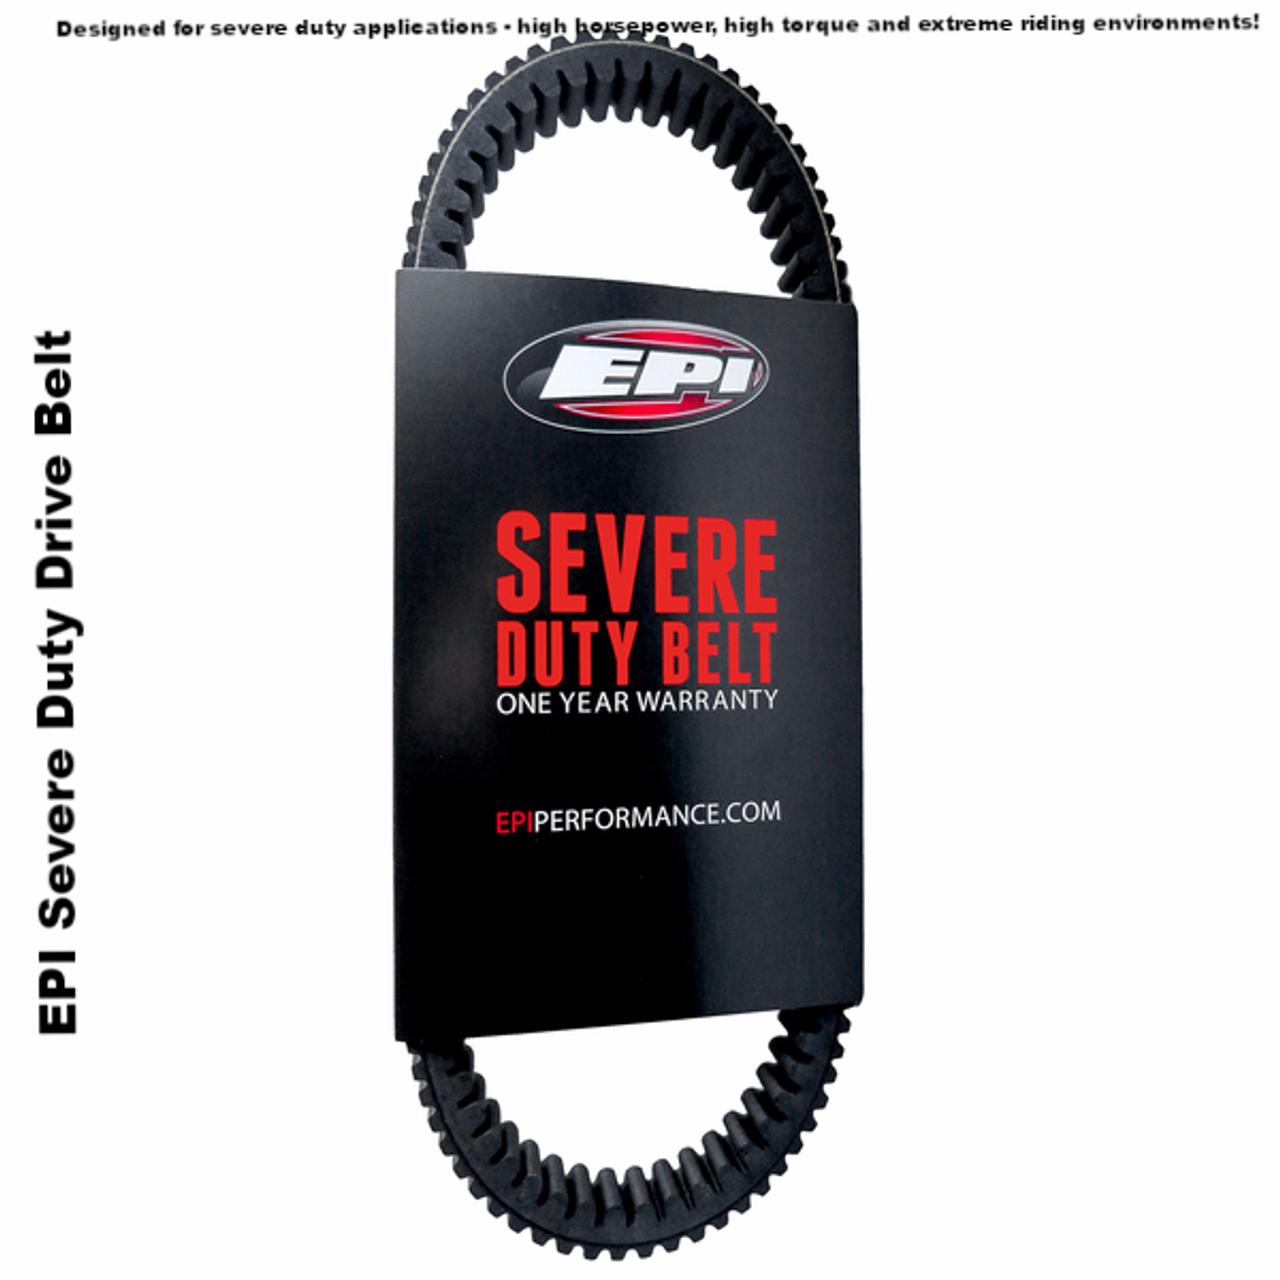 EPI Severe Duty Drive Belt Polaris Polaris Rzr Xp 1000 Turbo 2016 WE265028